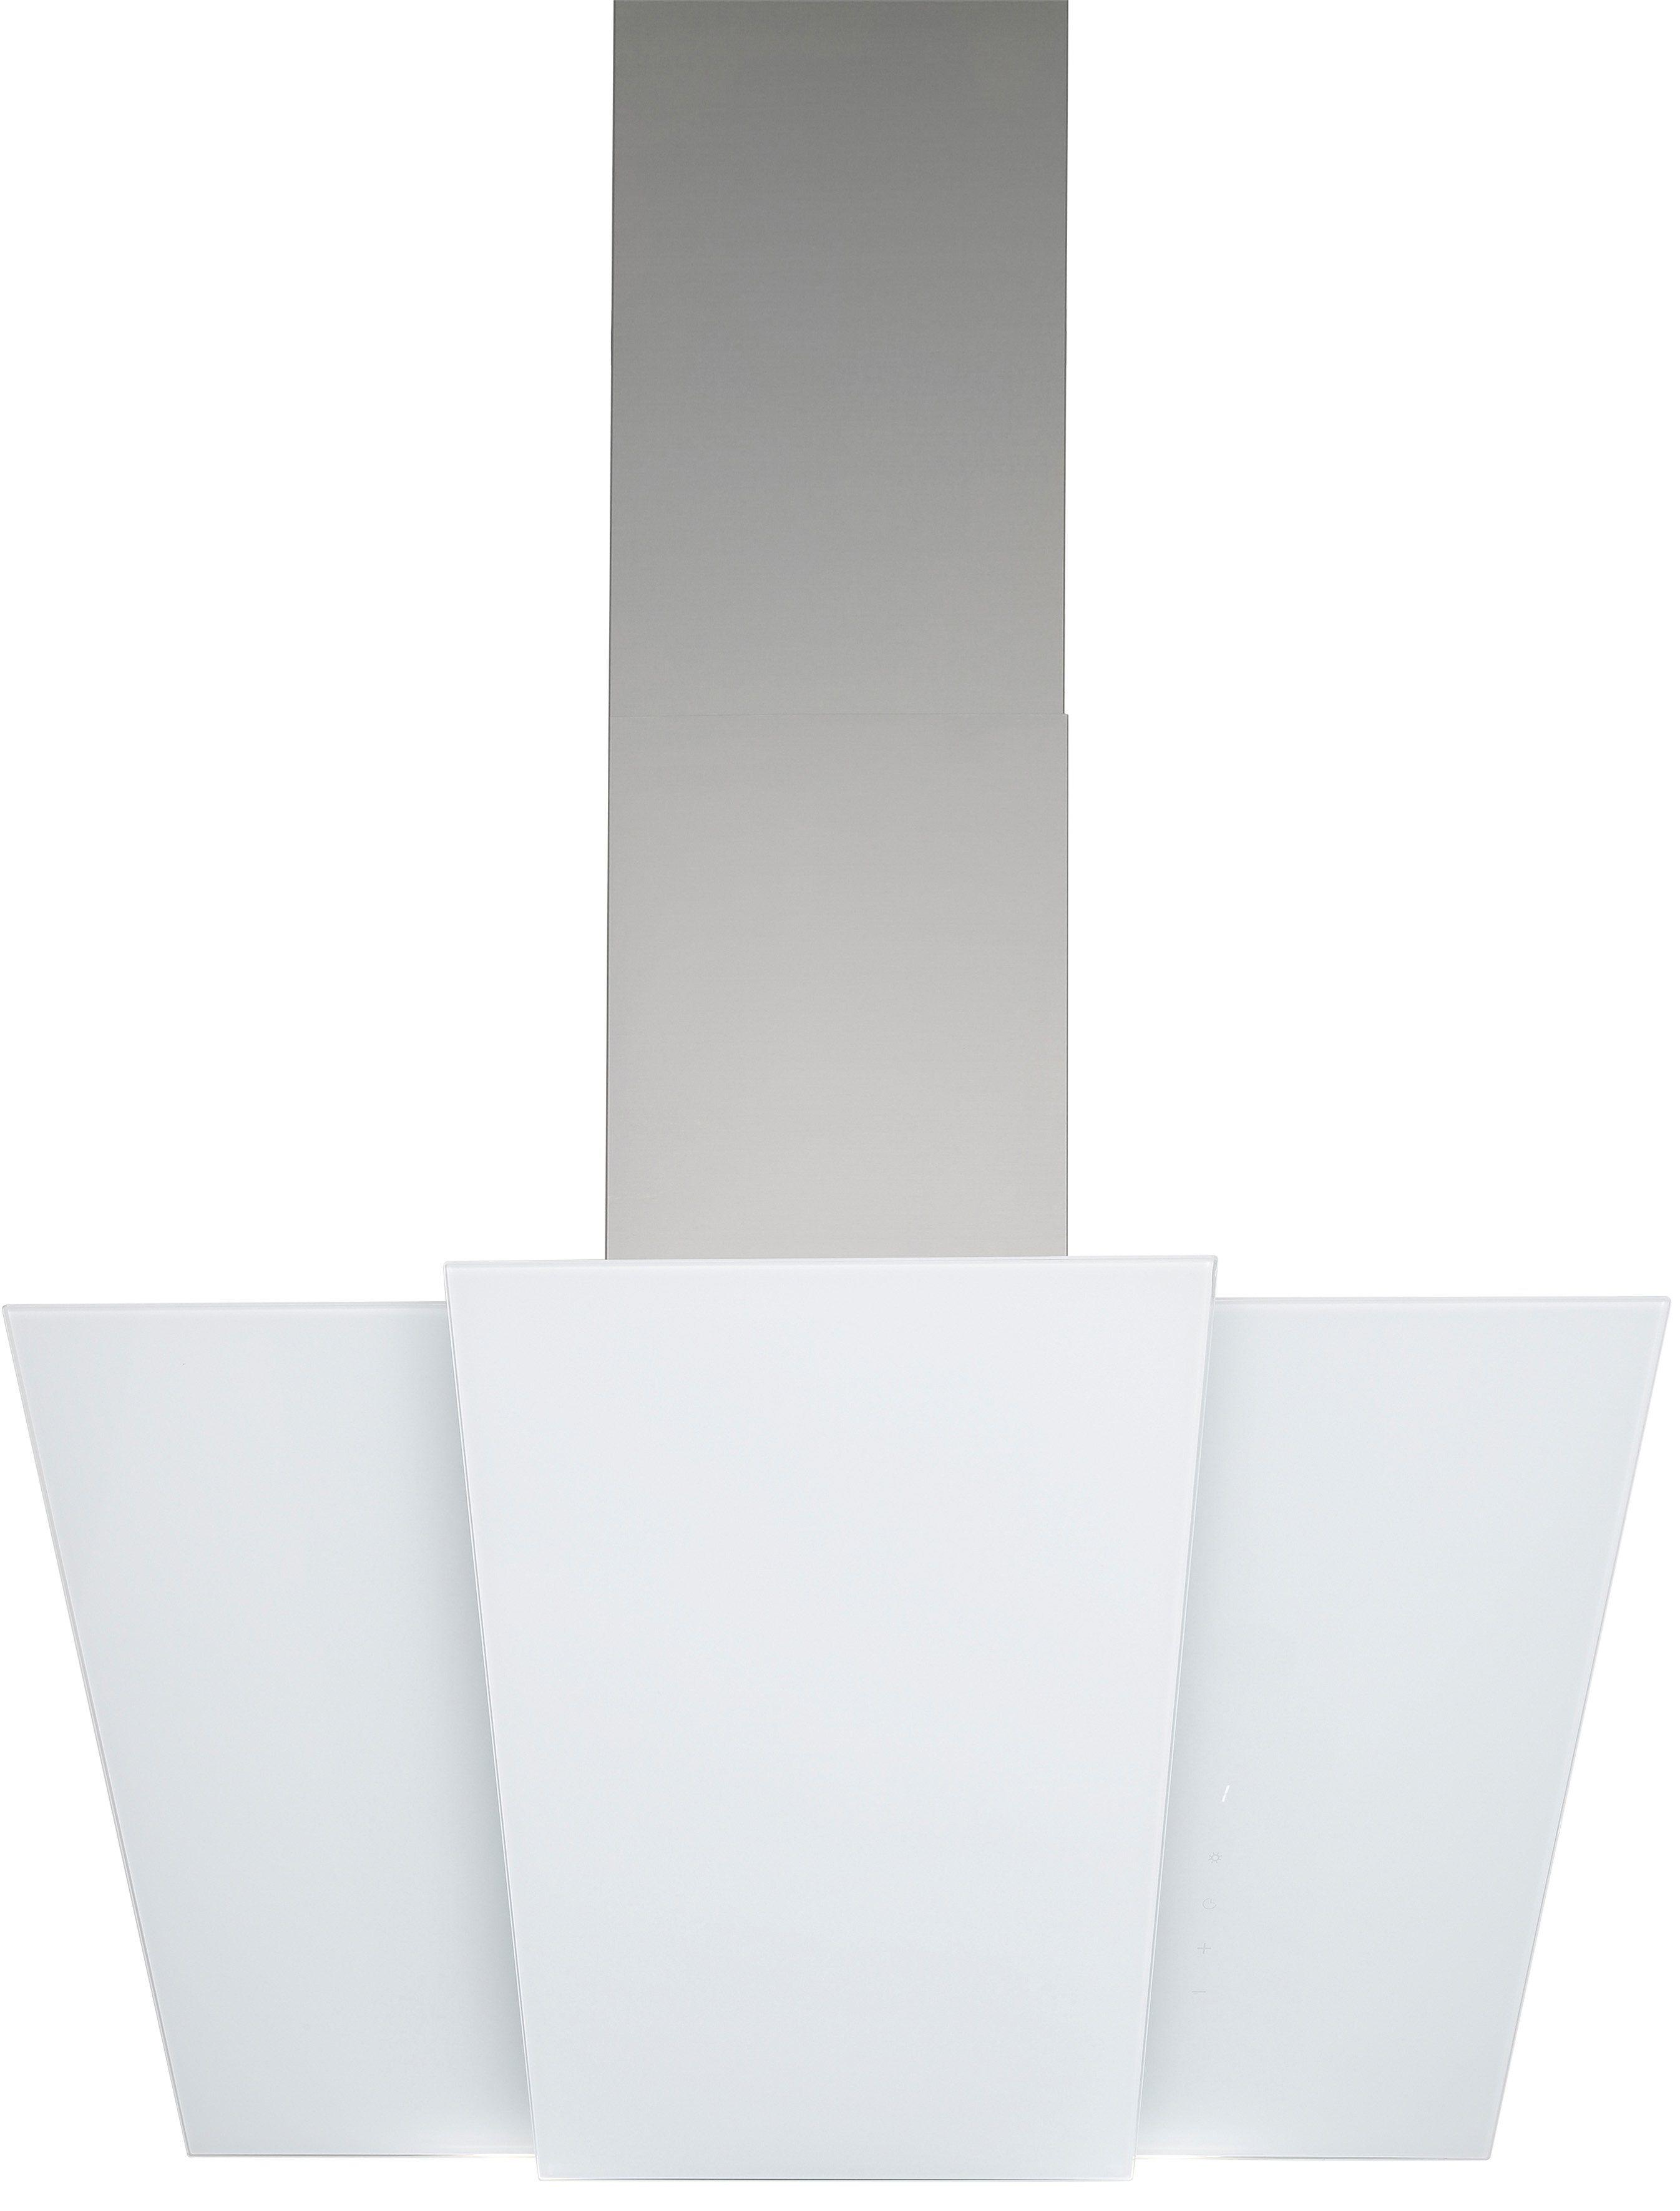 Amica Kopffreihaube KH 17179 E, LED Licht, Energieeffizienzklasse B